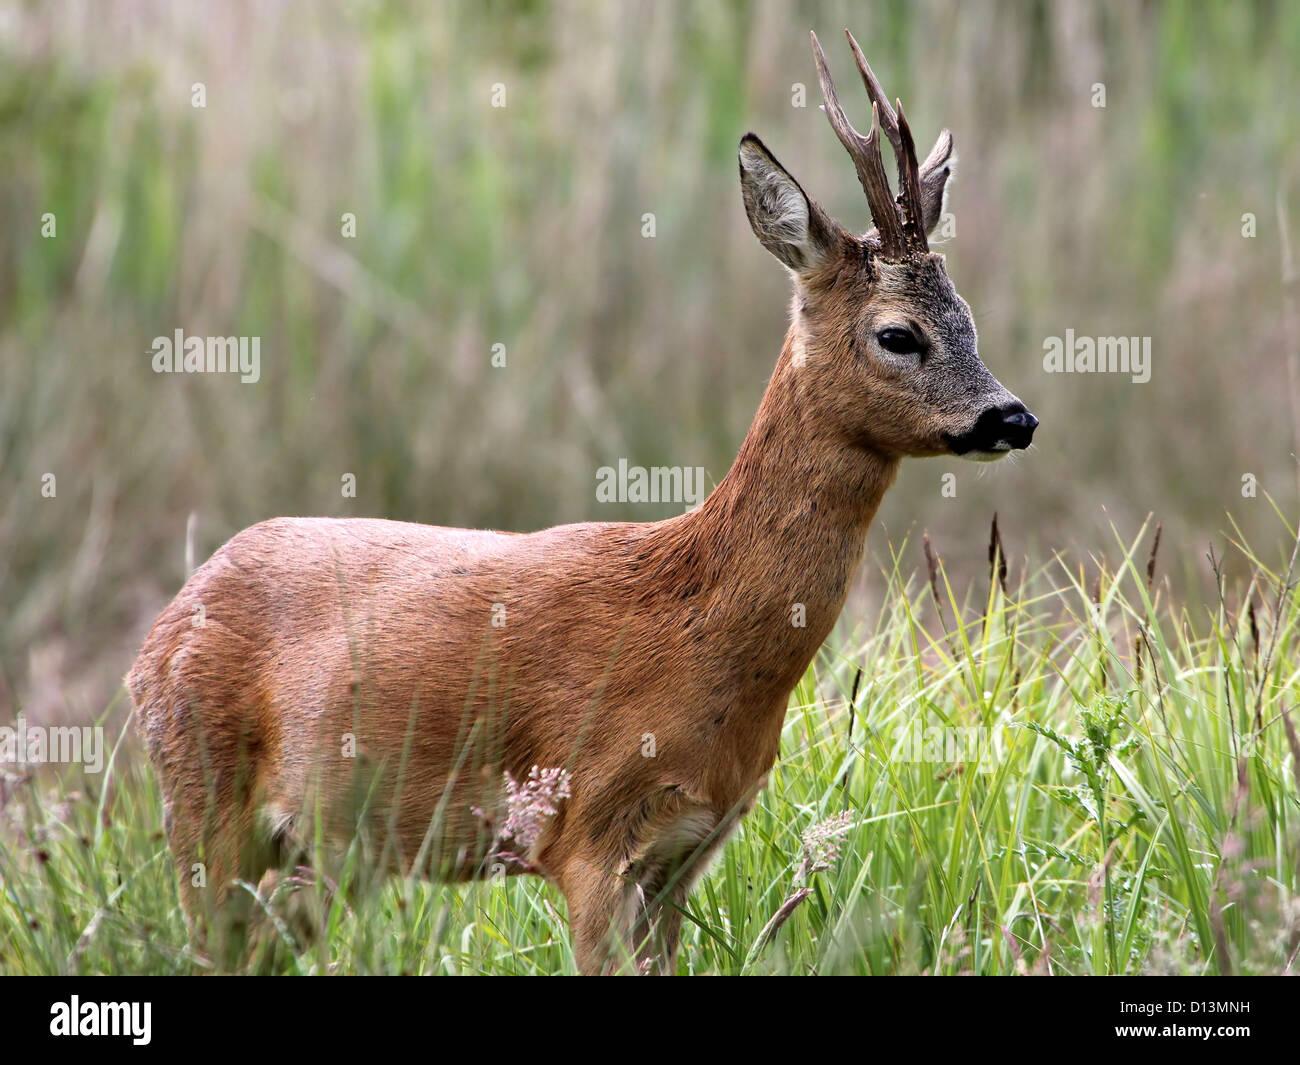 Male Roe Deer (Capreolus capreolus) seen in profile, deliberating flight or fight - Stock Image